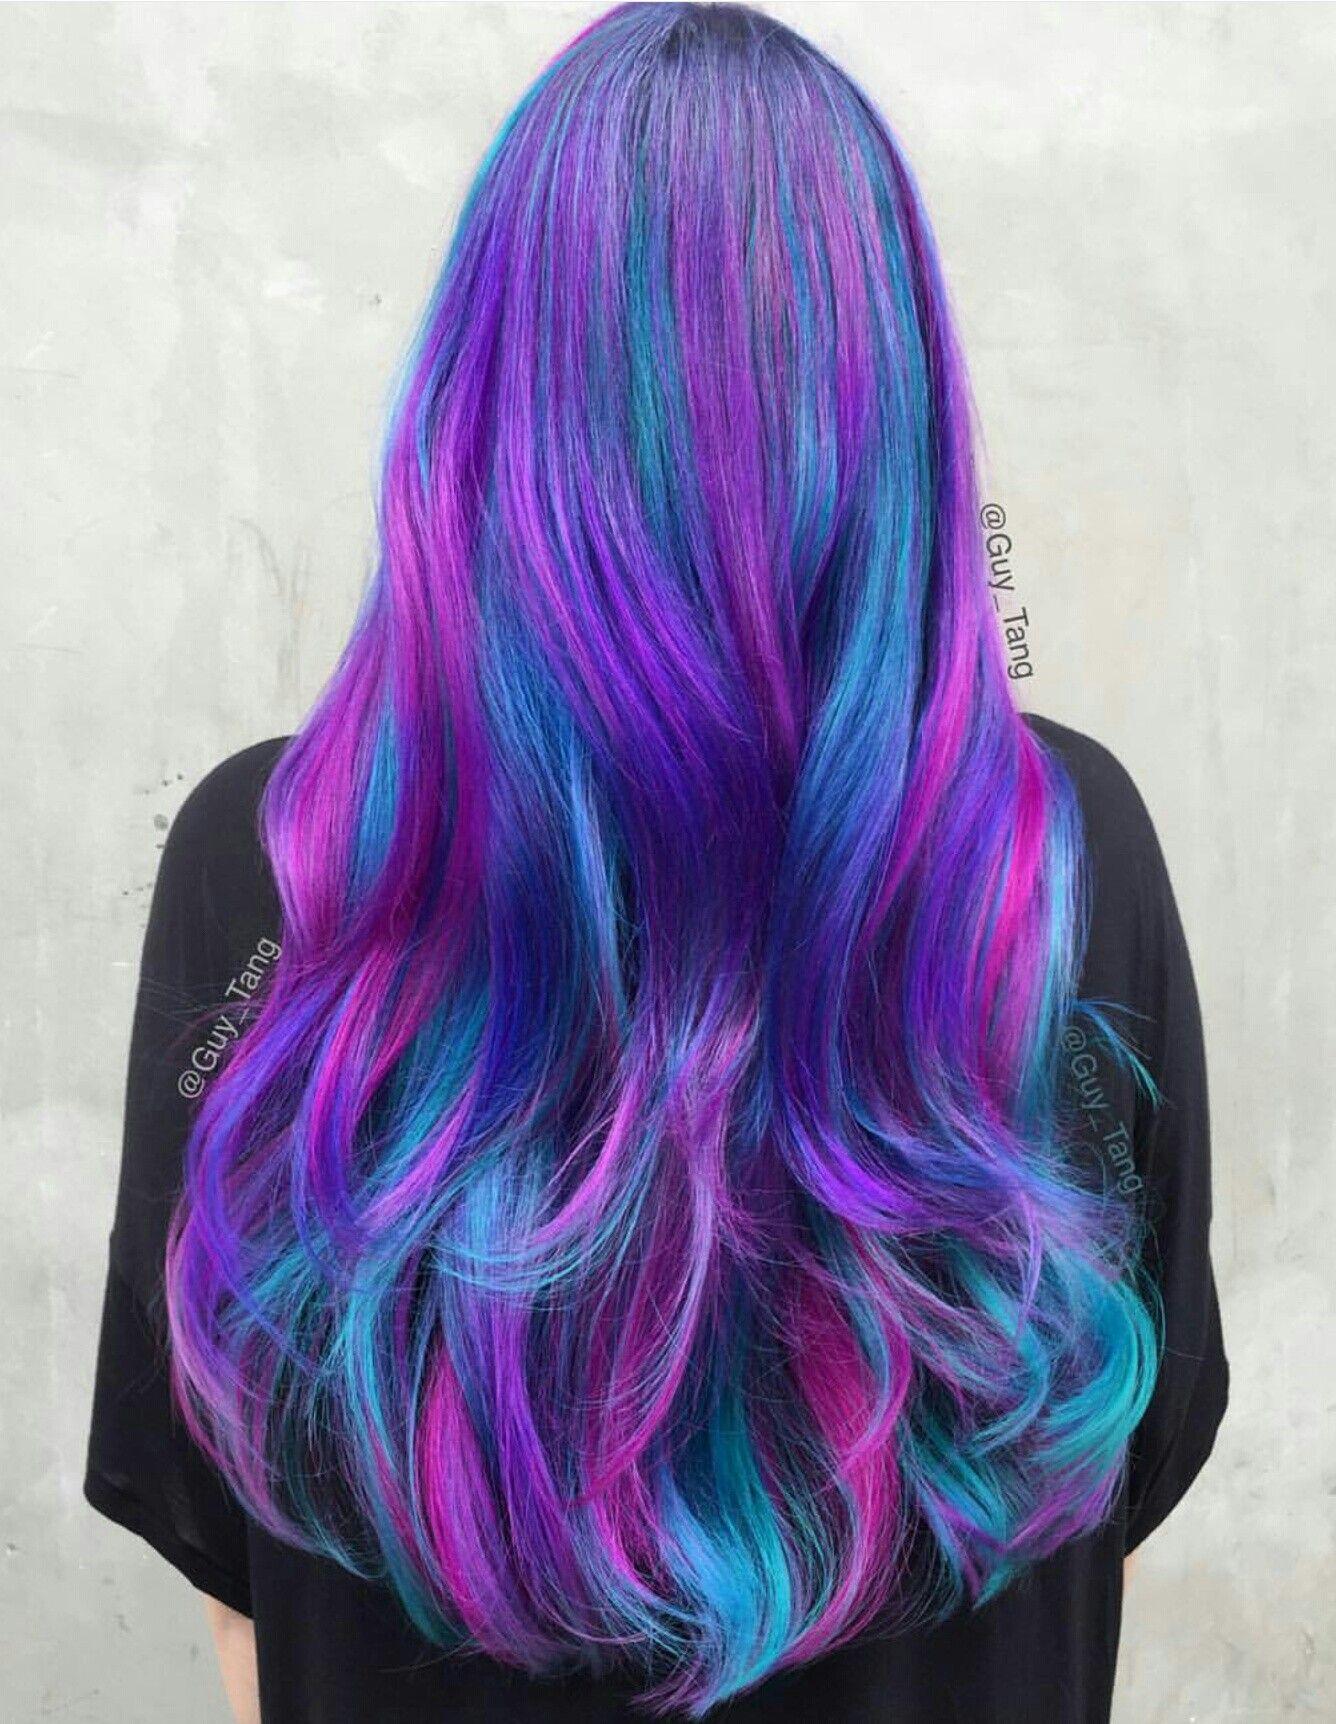 purple blue & pink colorful long